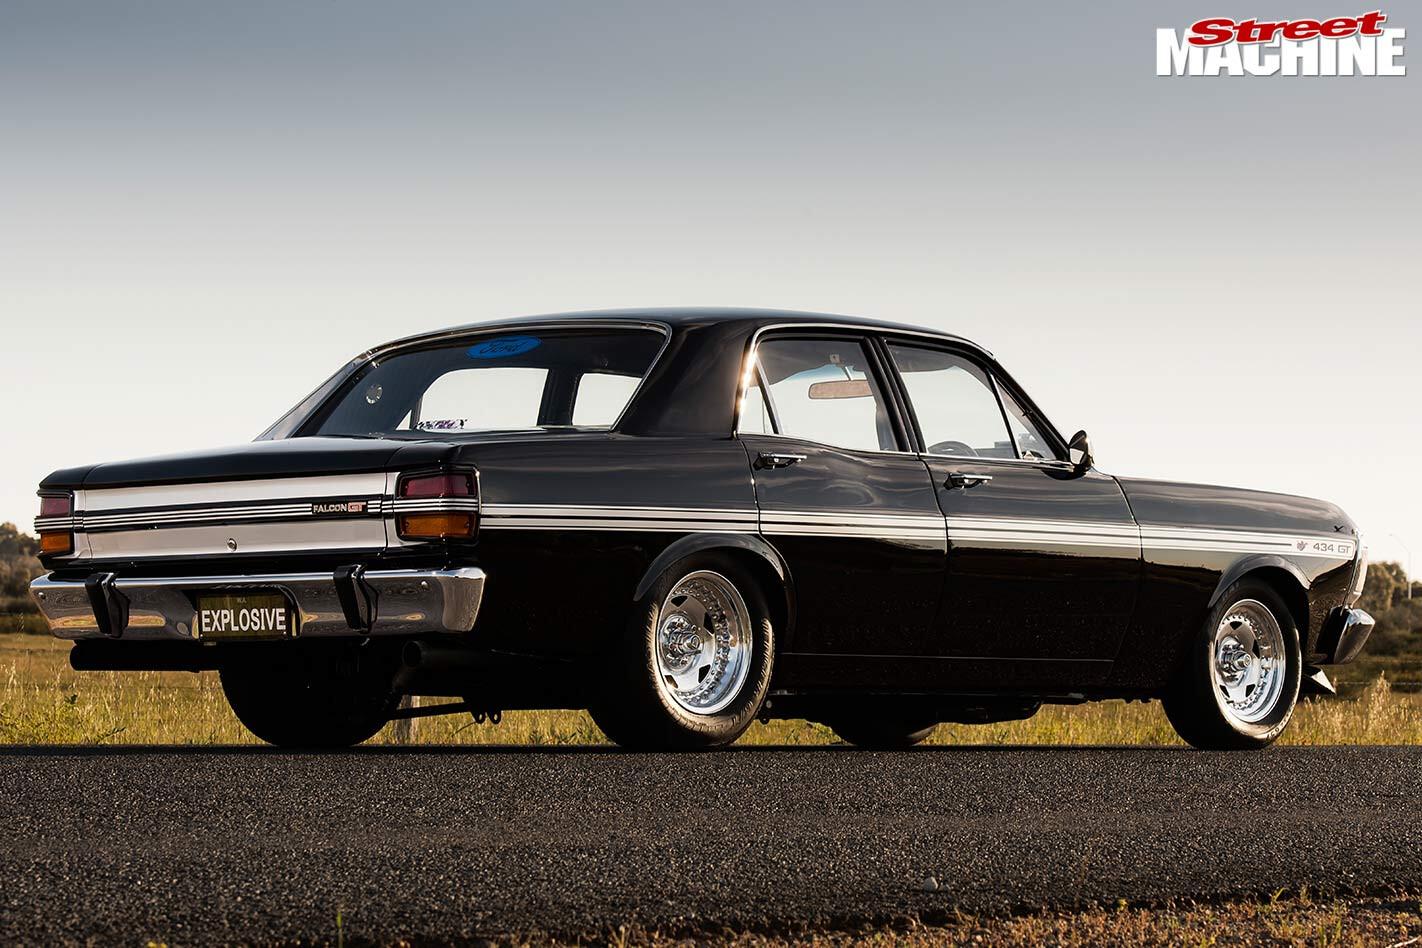 Ford XY Fairmont rear